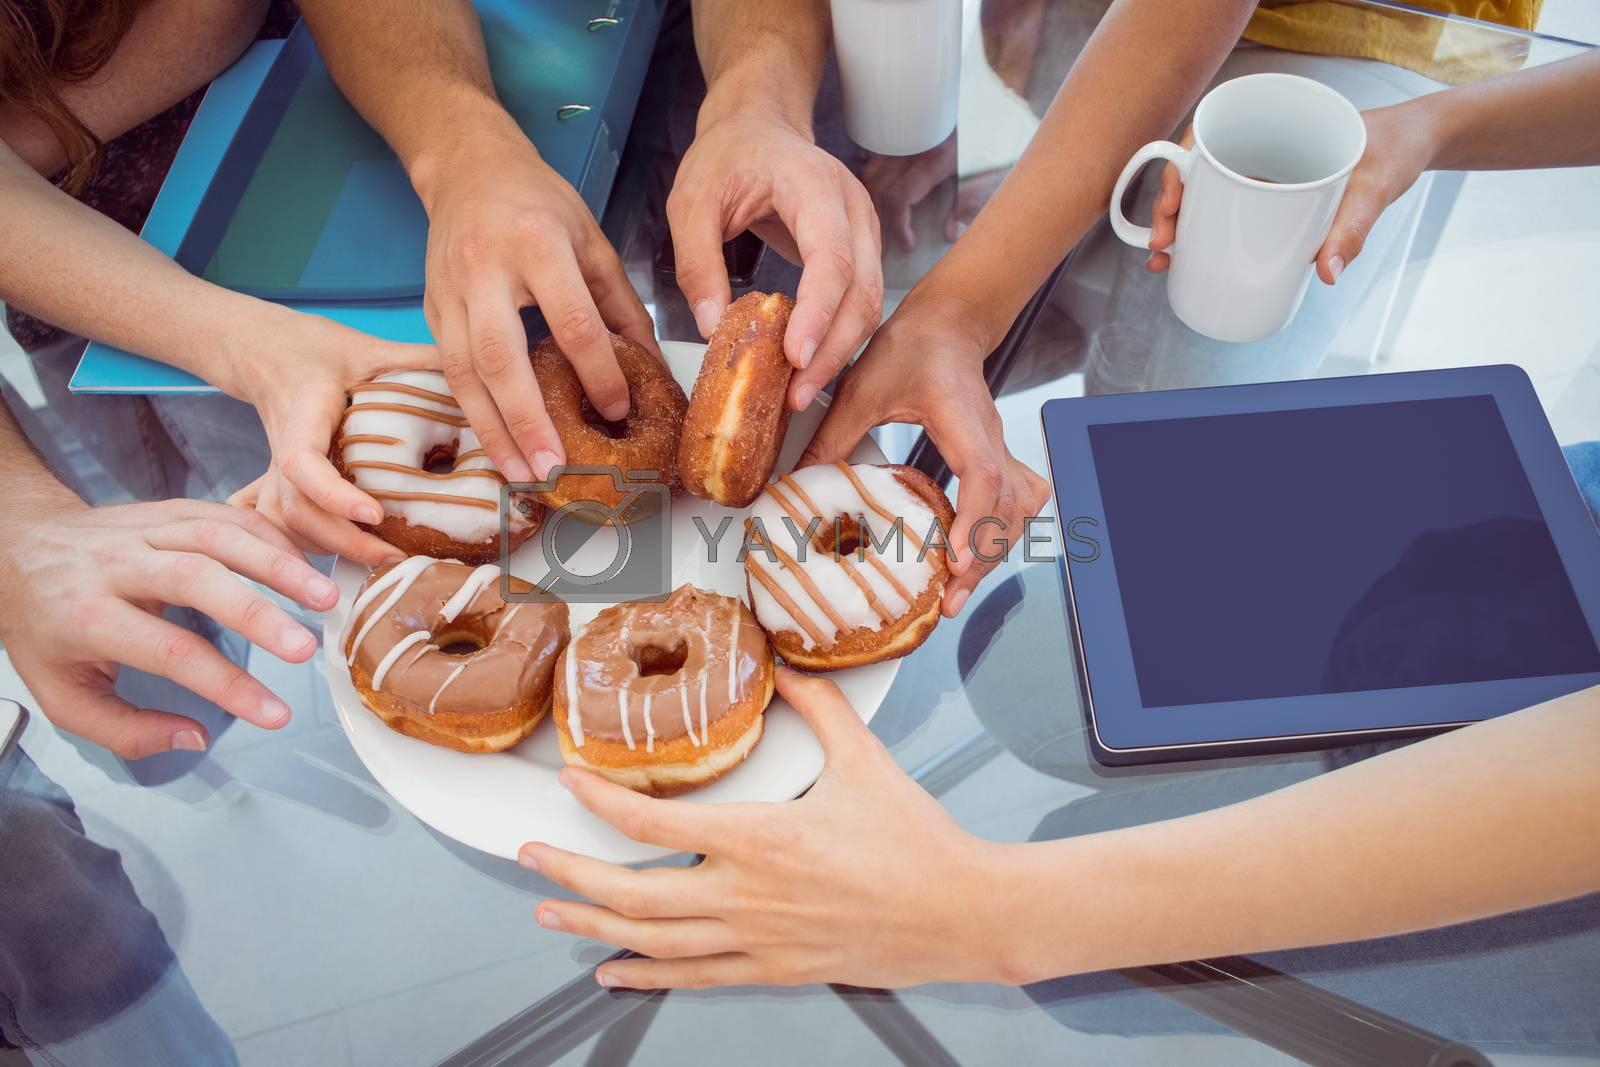 Fashion students eating doughnuts  by Wavebreakmedia